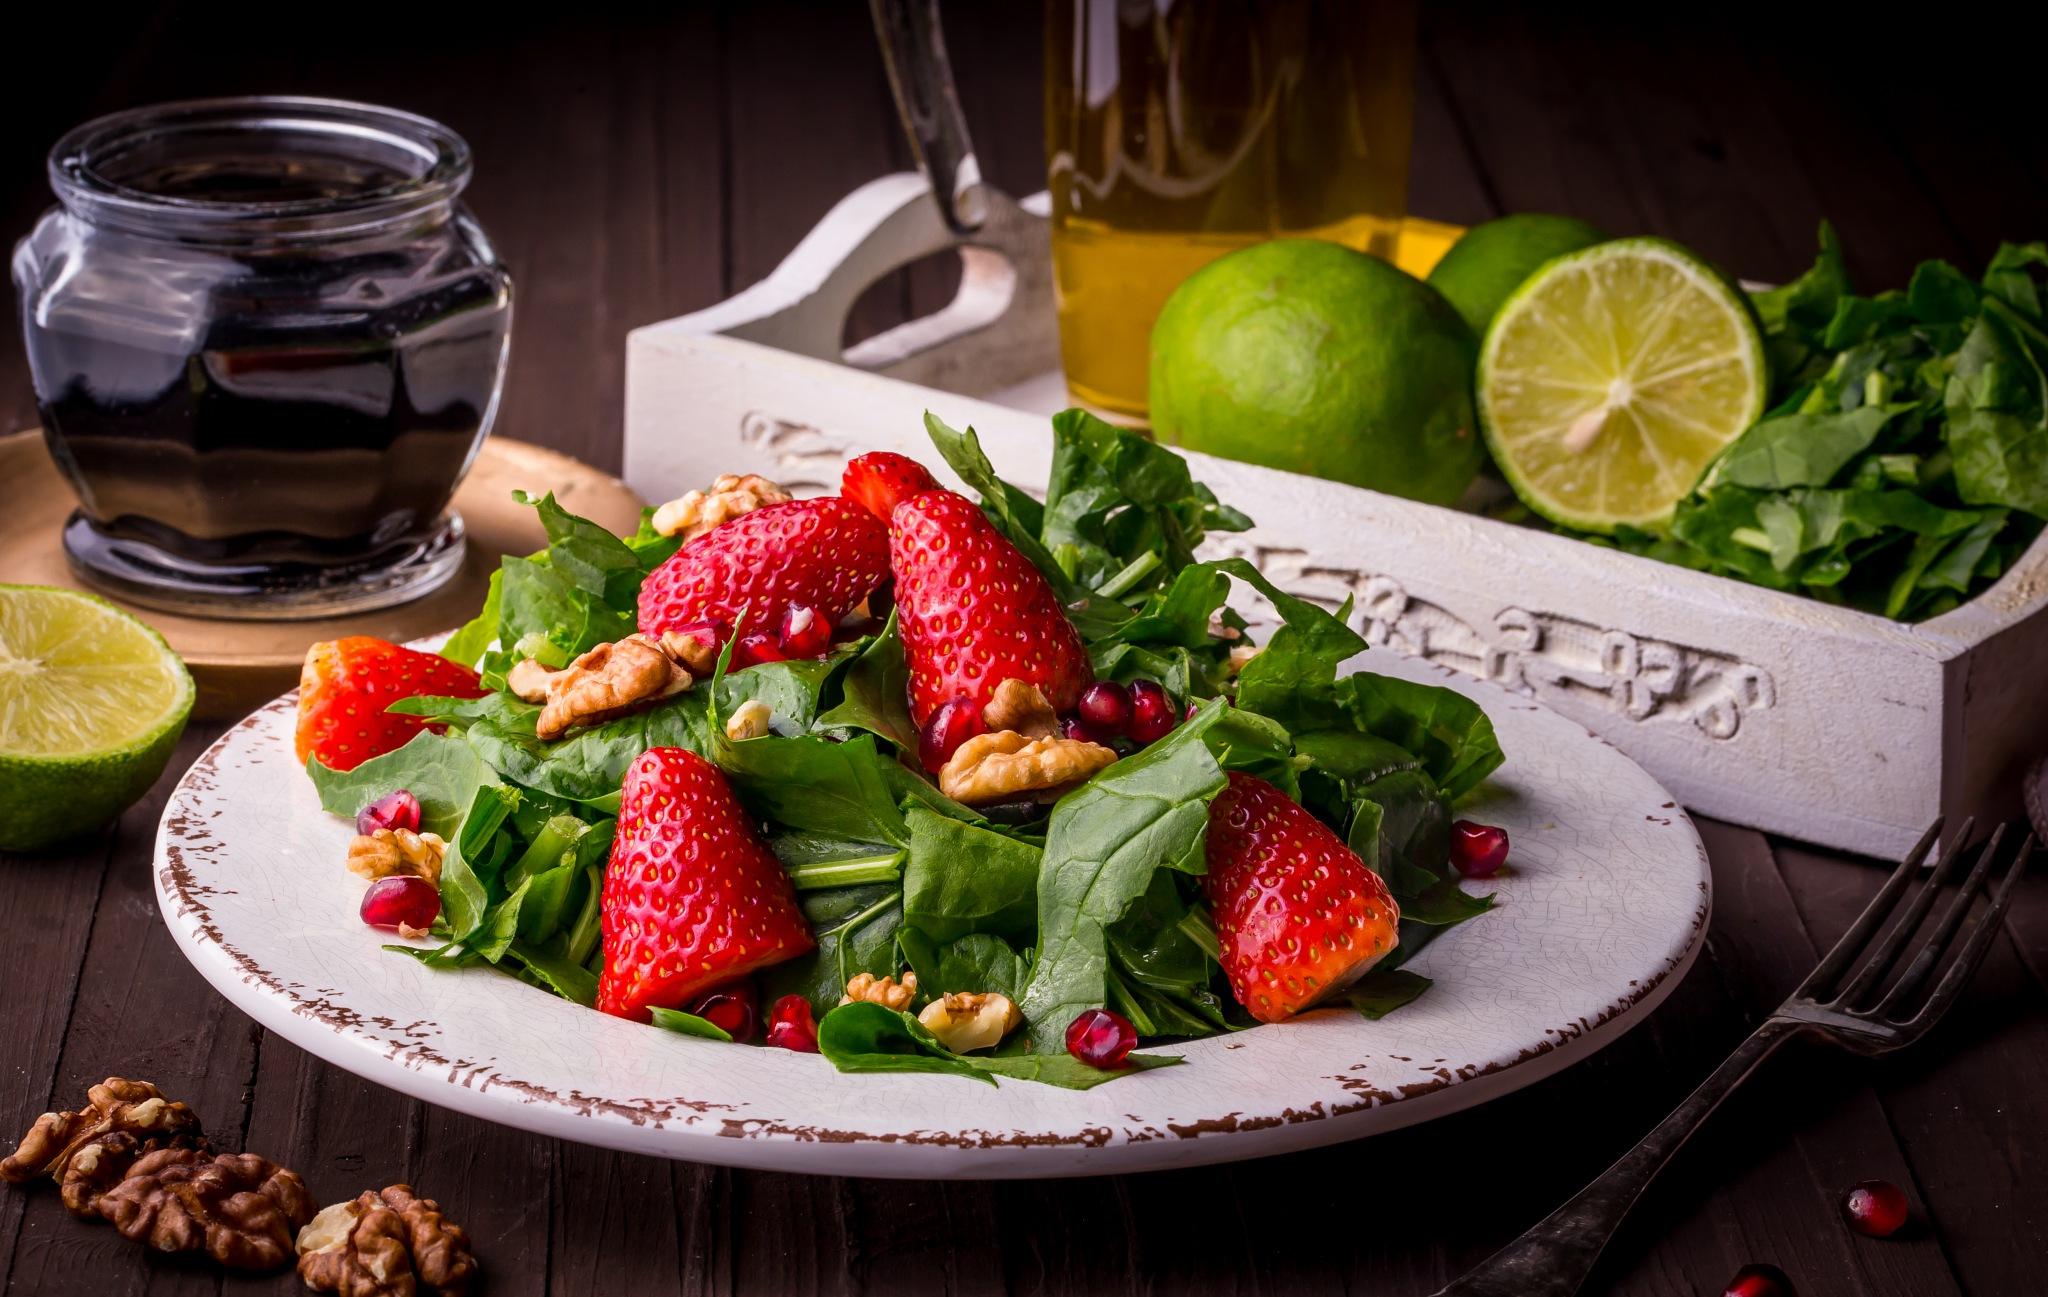 Spinach Salad by Abeer Steitieh